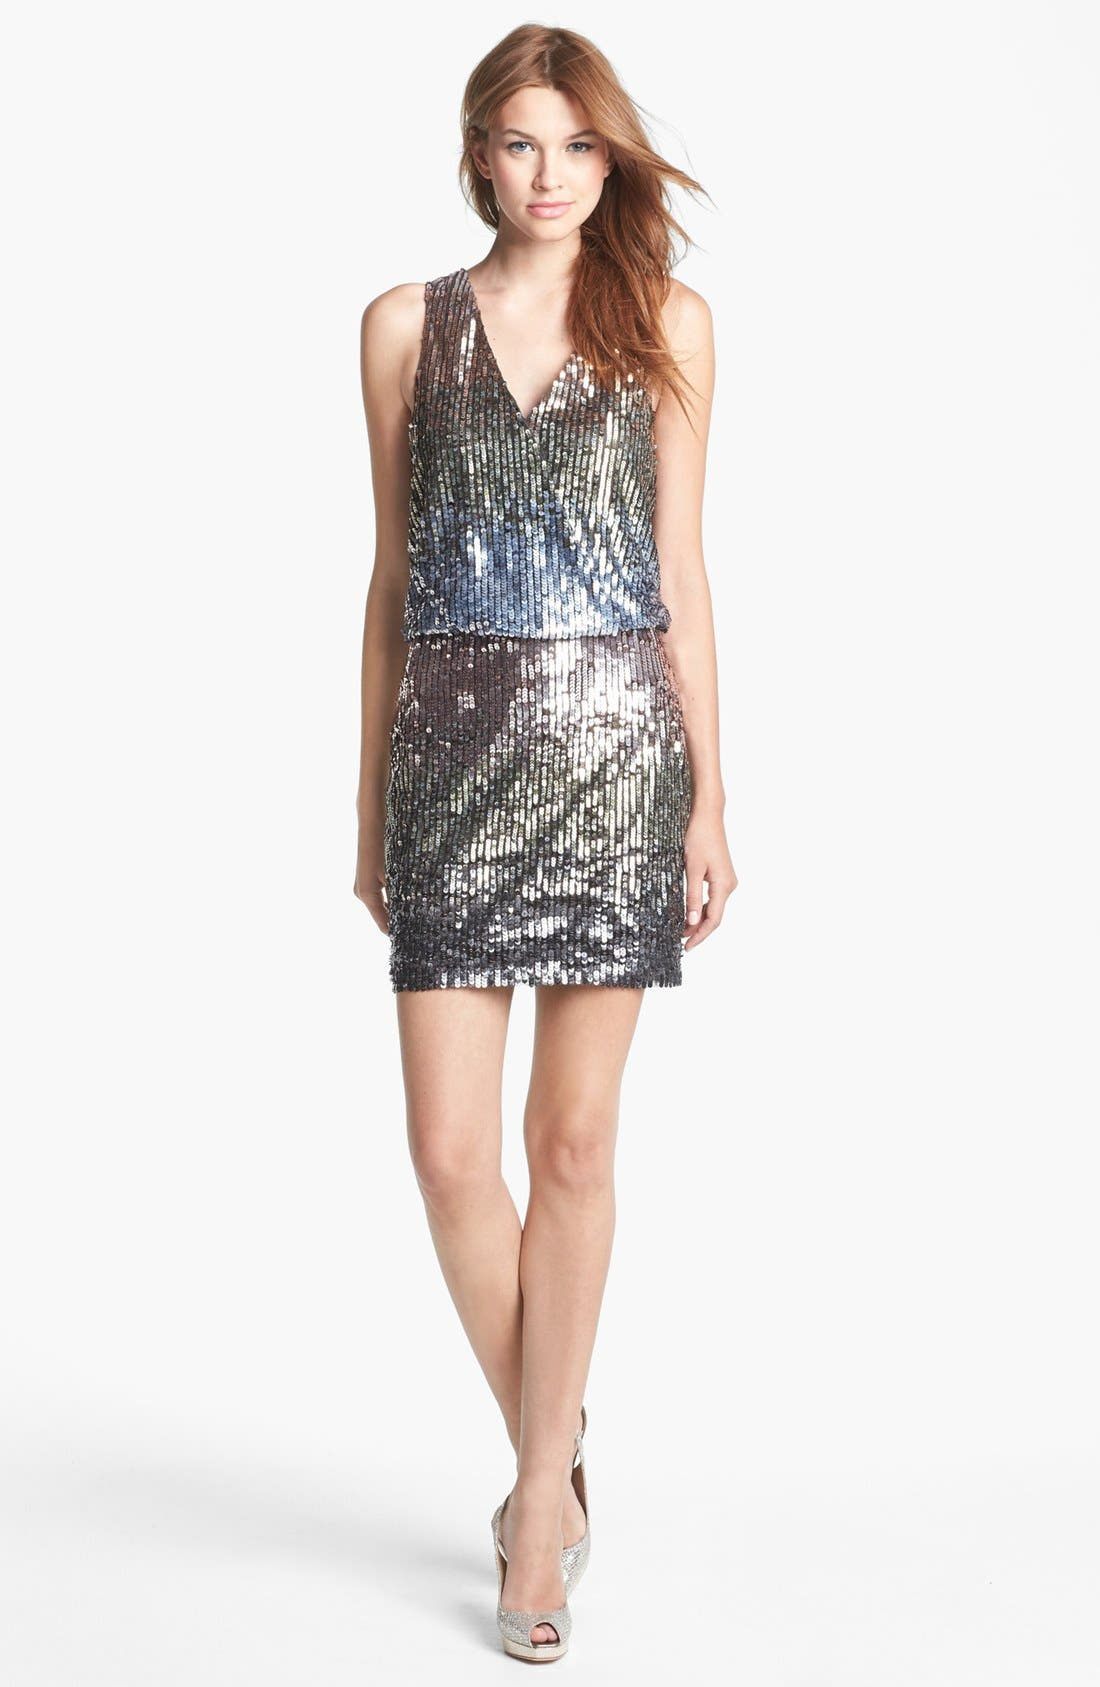 Main Image - Nicole Miller Sleeveless Ombré Sequin Dress